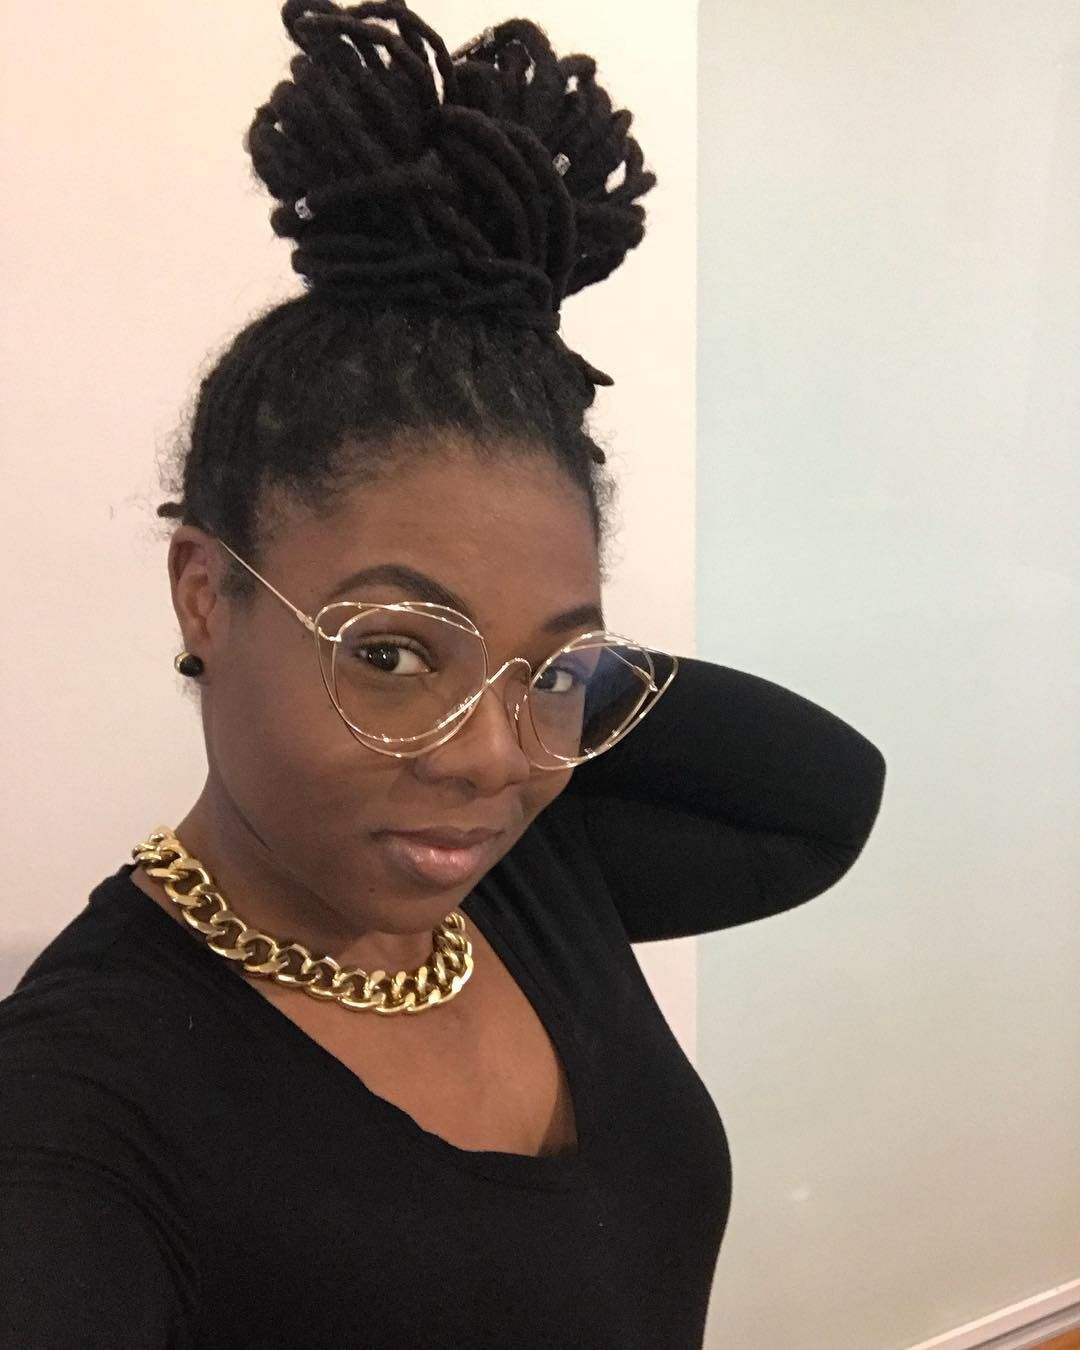 Empress ruling over her own empire #Locs #LocGirlsRock #ThickLocs #HealthyLocs #DearLocs #WomenWithLocs #LocLife #iamLocd #TriniLocs #Locology #NaturallyChicLocs #loccommunity #LocJourney #TeamNatural #LadiesWithLocs #locgirlmagic #misslocspageant #MelaninWithASideOfLocs #iAmLocd #LocksWorld_OneLove #LocLivin #TeamLocs #ThickLocs #BrooklynLocs #❤️ #